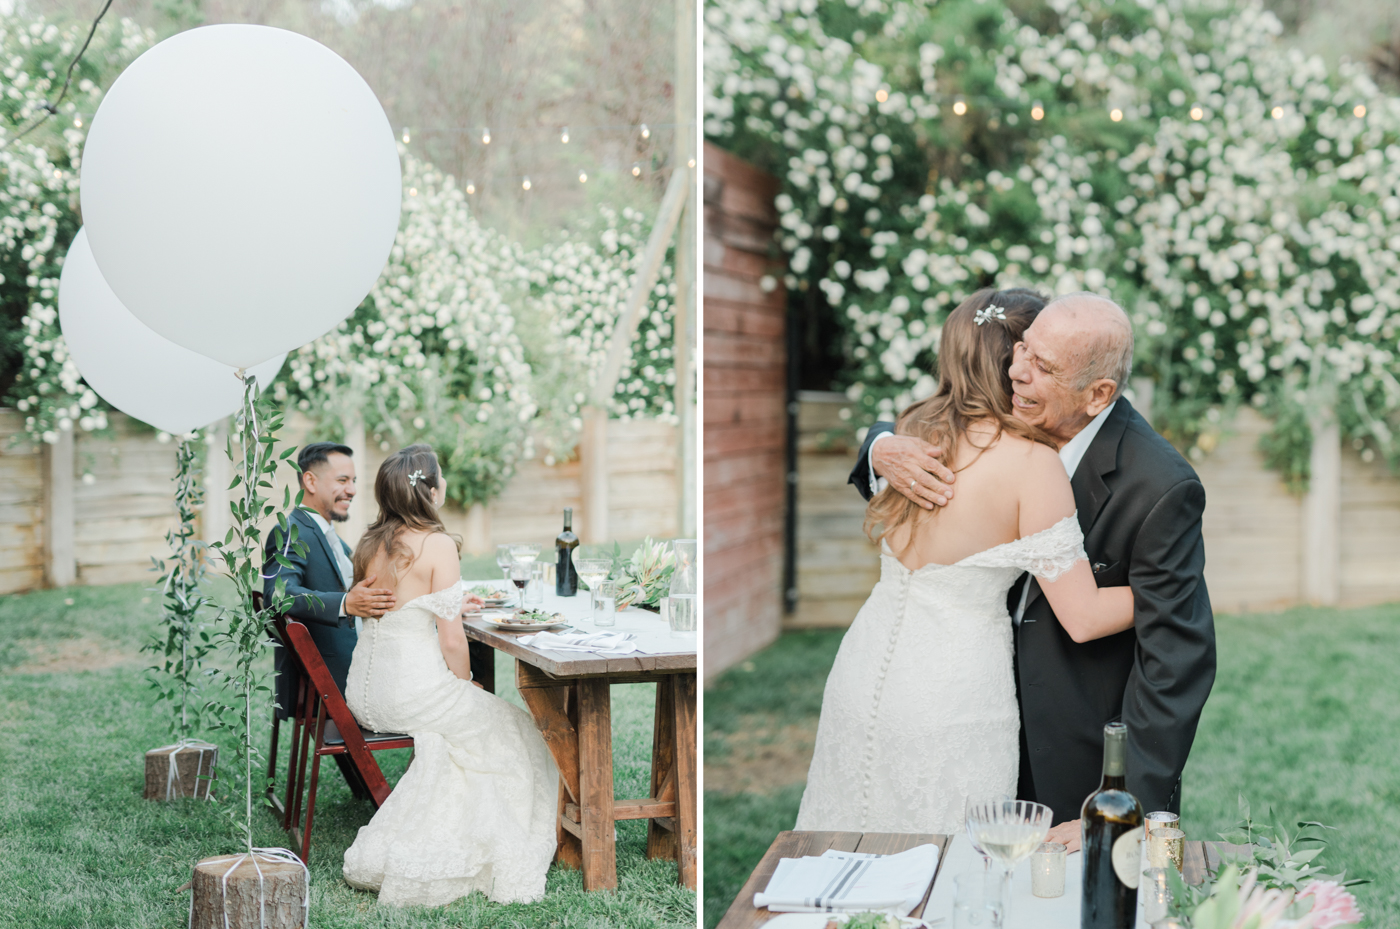 l&c-the_1909_spring_garden_wedding_los_angeles_fine_art_wedding_photographer-36.jpg